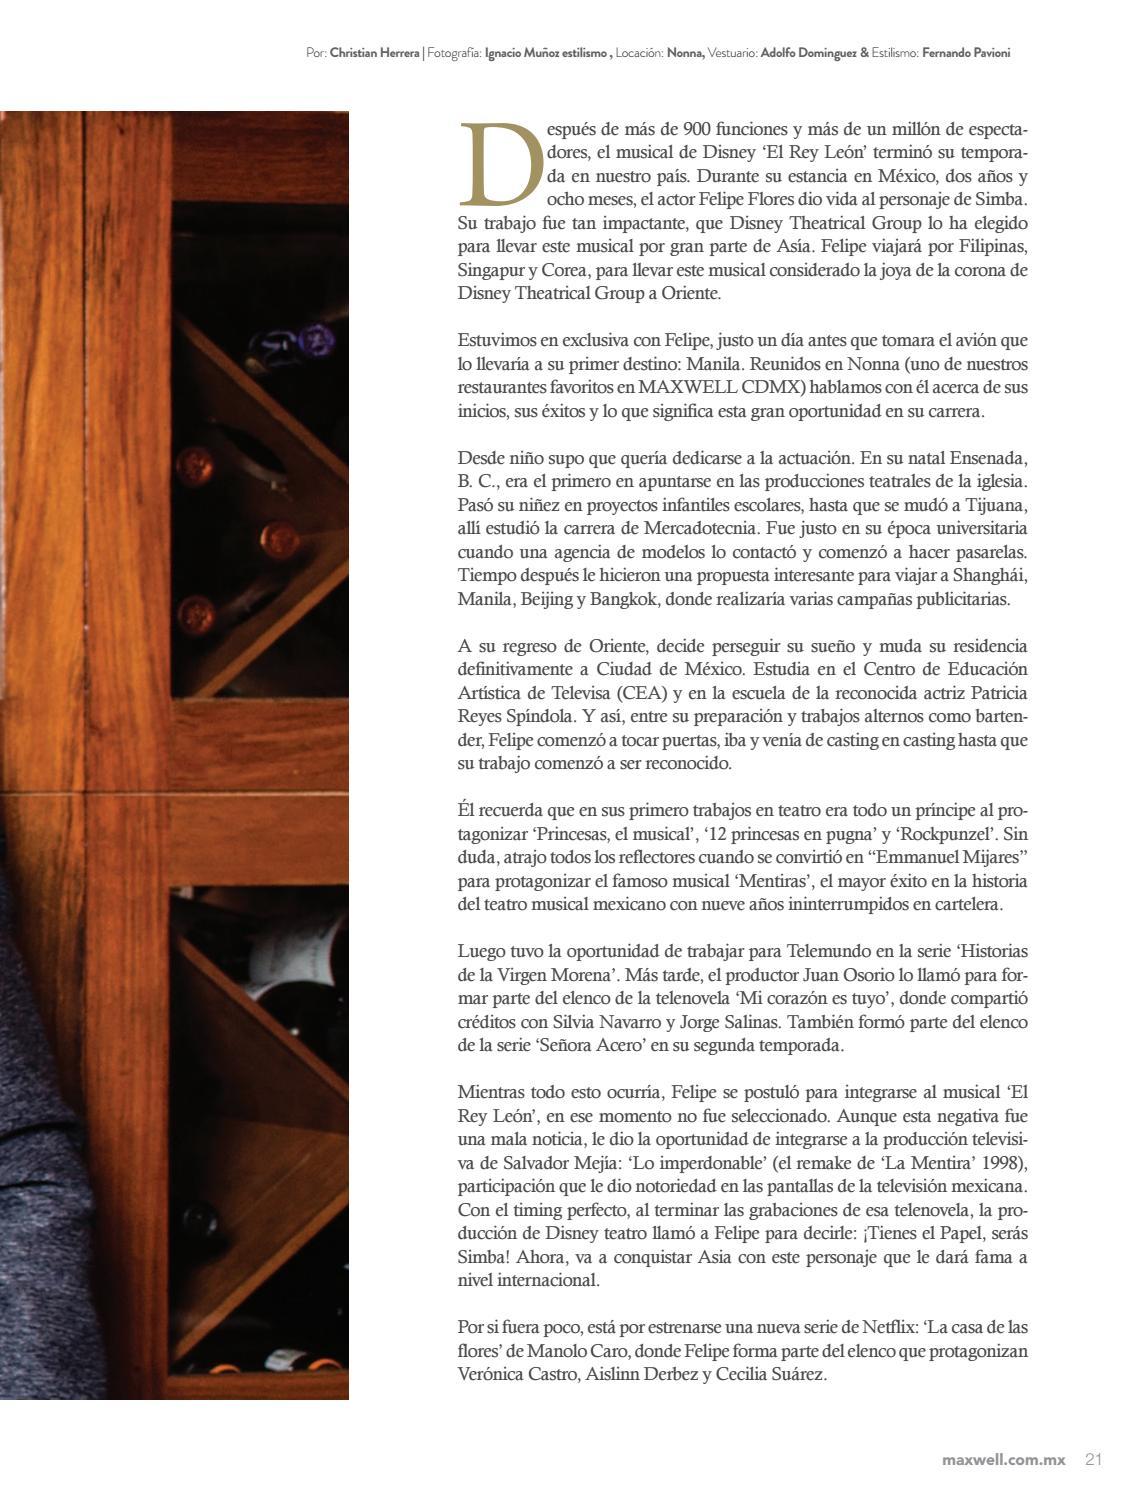 Revista Maxwell CDMX  37 by Grupo Editorial Maxwell - issuu